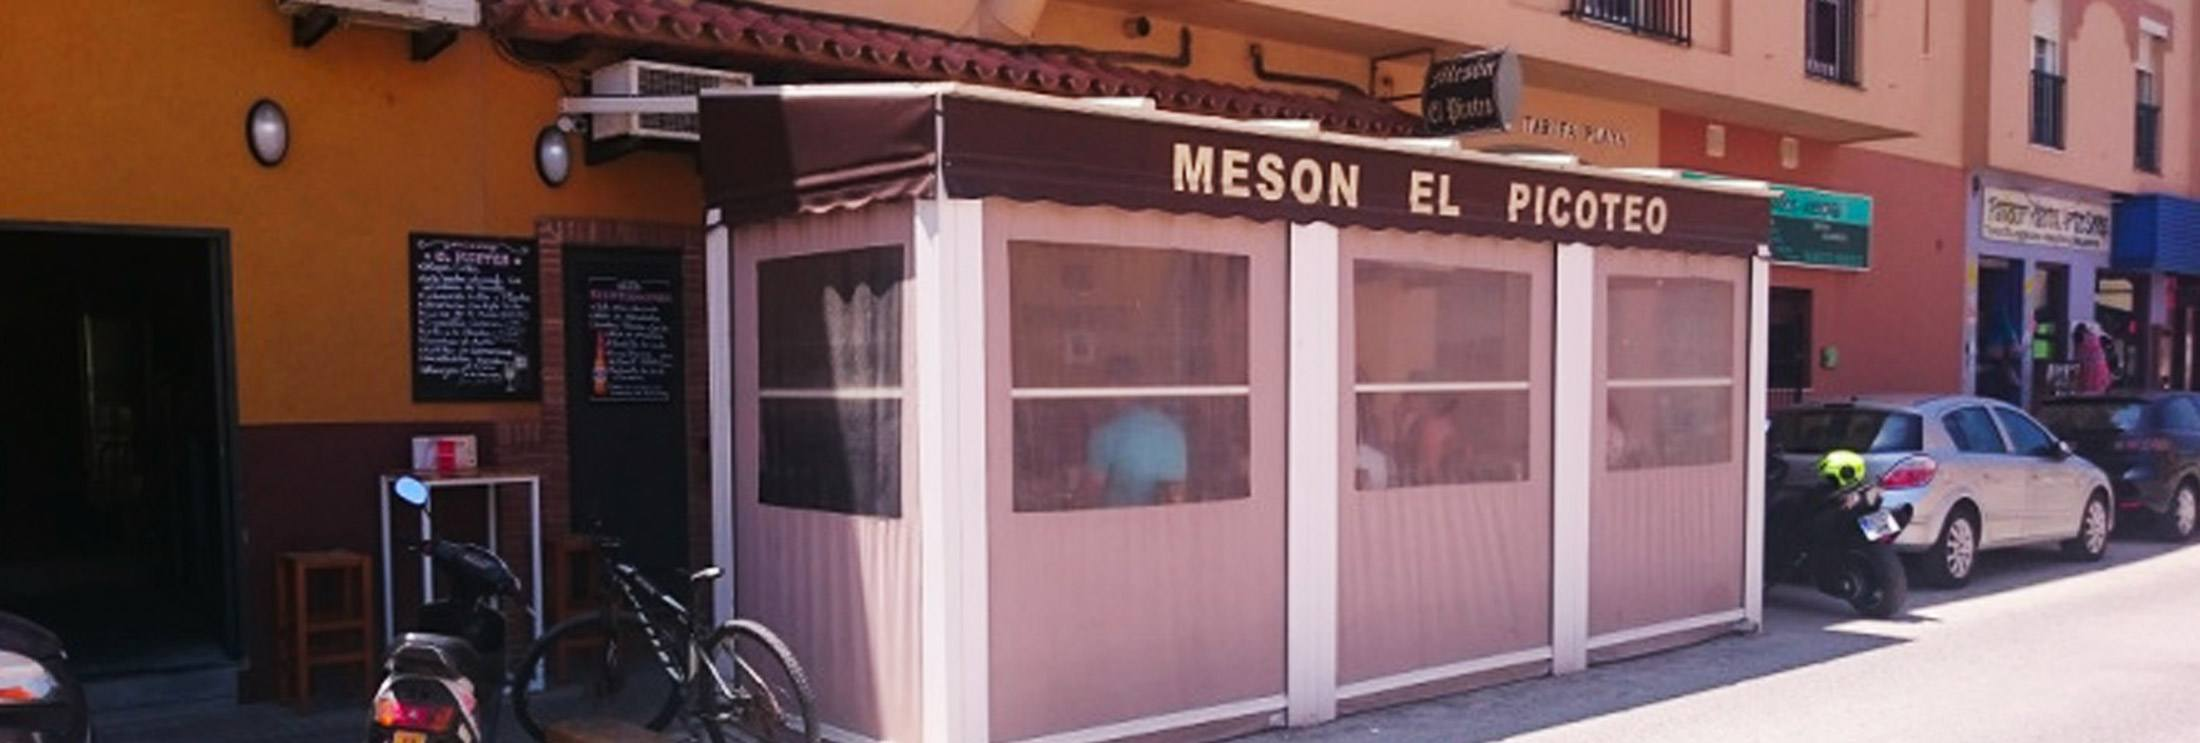 El Meson Picoteo Tarifa, Restaurants-Andalousian food-Seafood